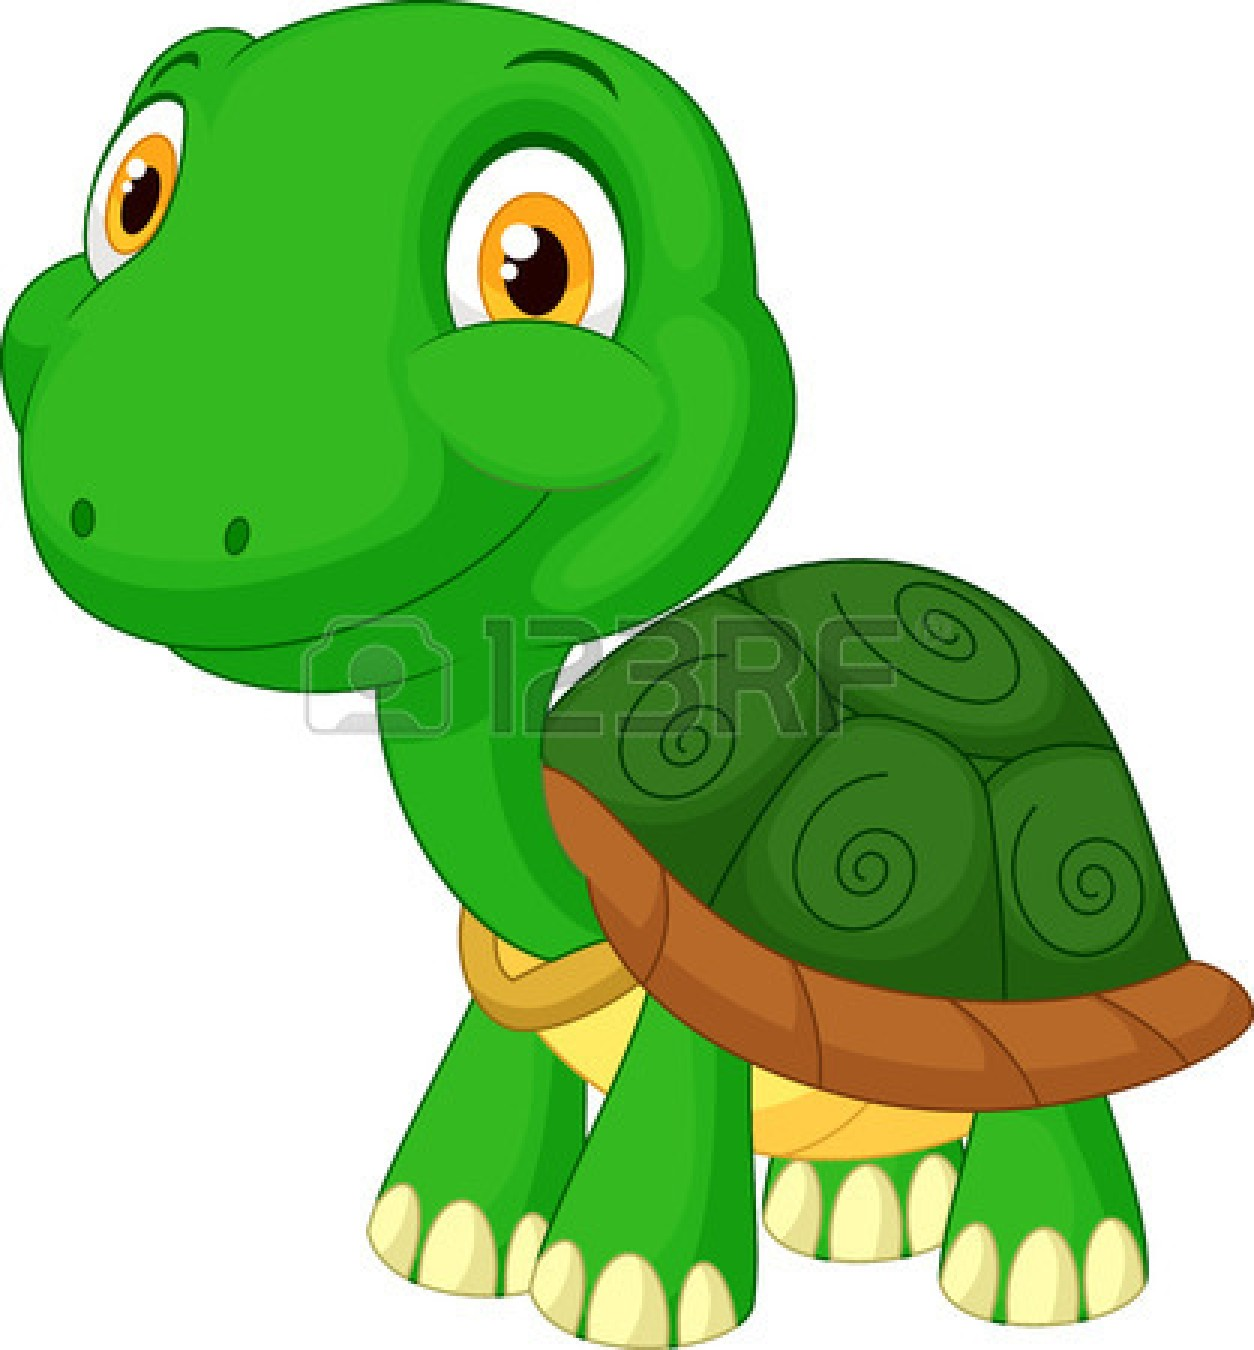 Turtoise clipart Free Clipart Slow slow%20tortoise%20clipart Images